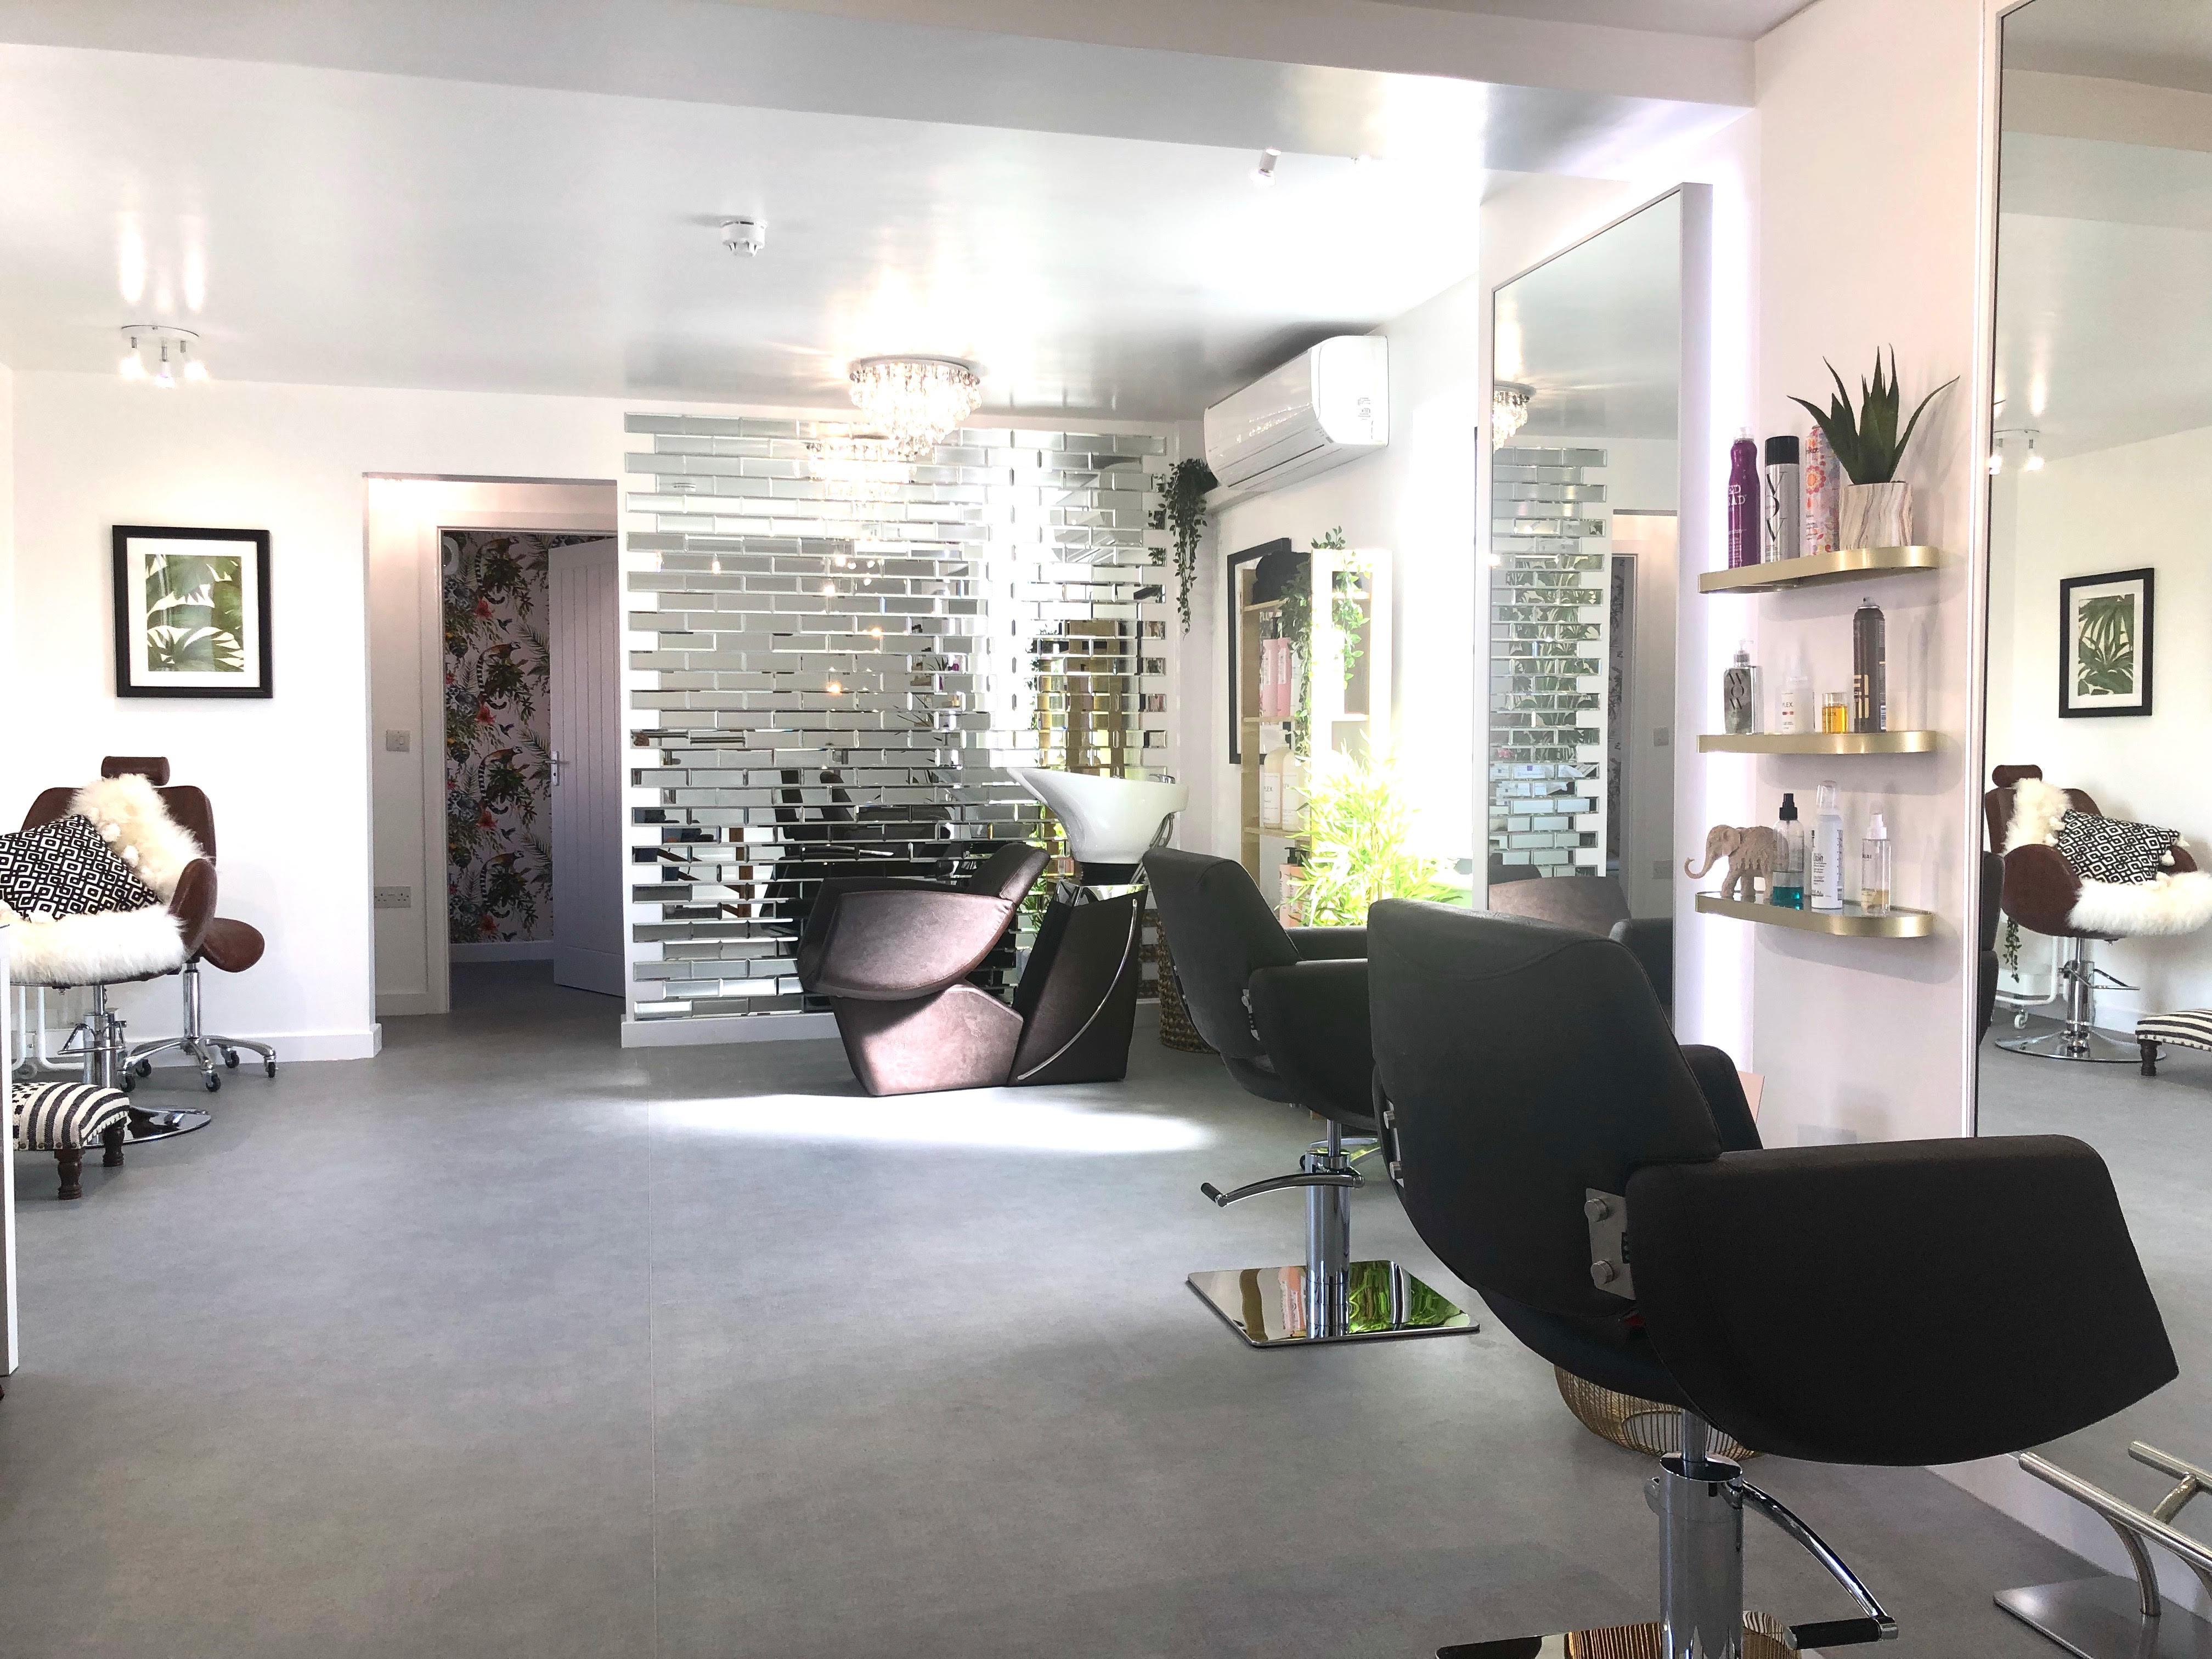 Moor Street Hairdressers